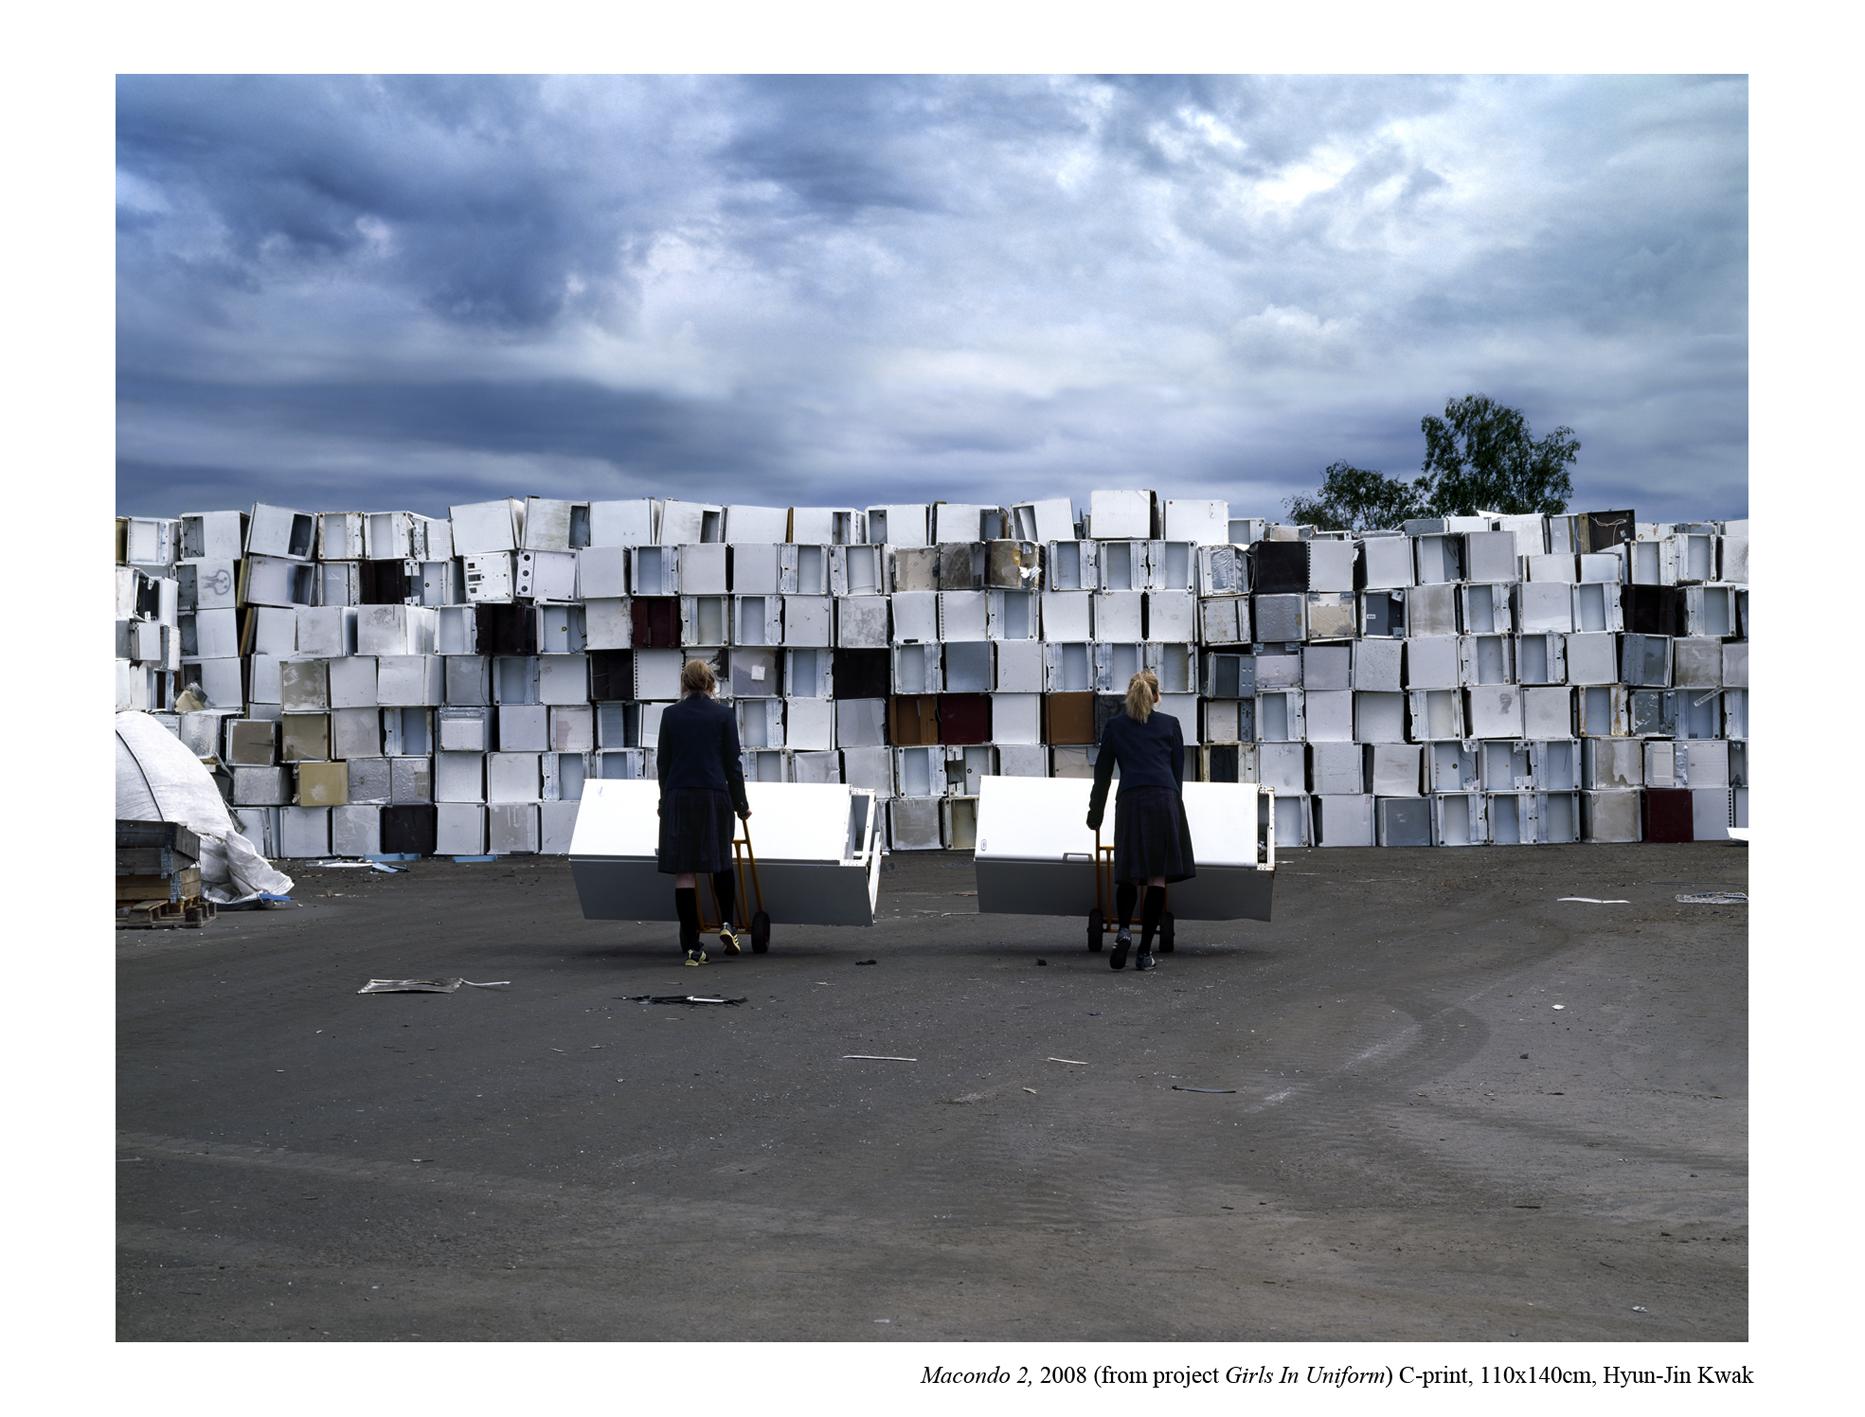 Hyun-Jin Kwak, Macondo 2, 2008 110x150cm C- print